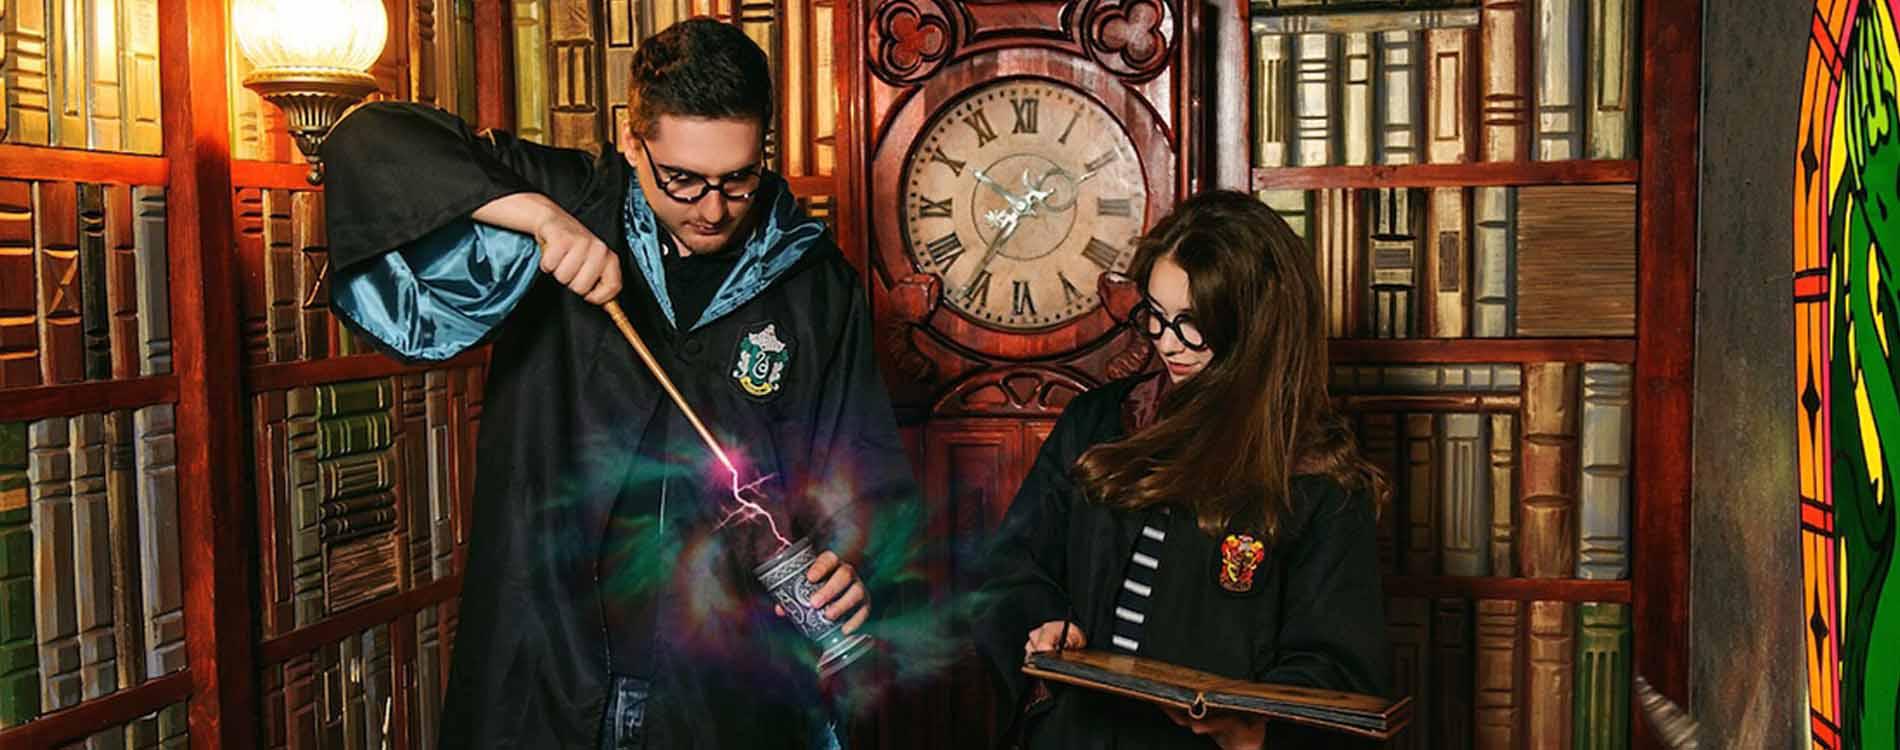 Школа магия гарри поттер и гадания на отношения человека на картах